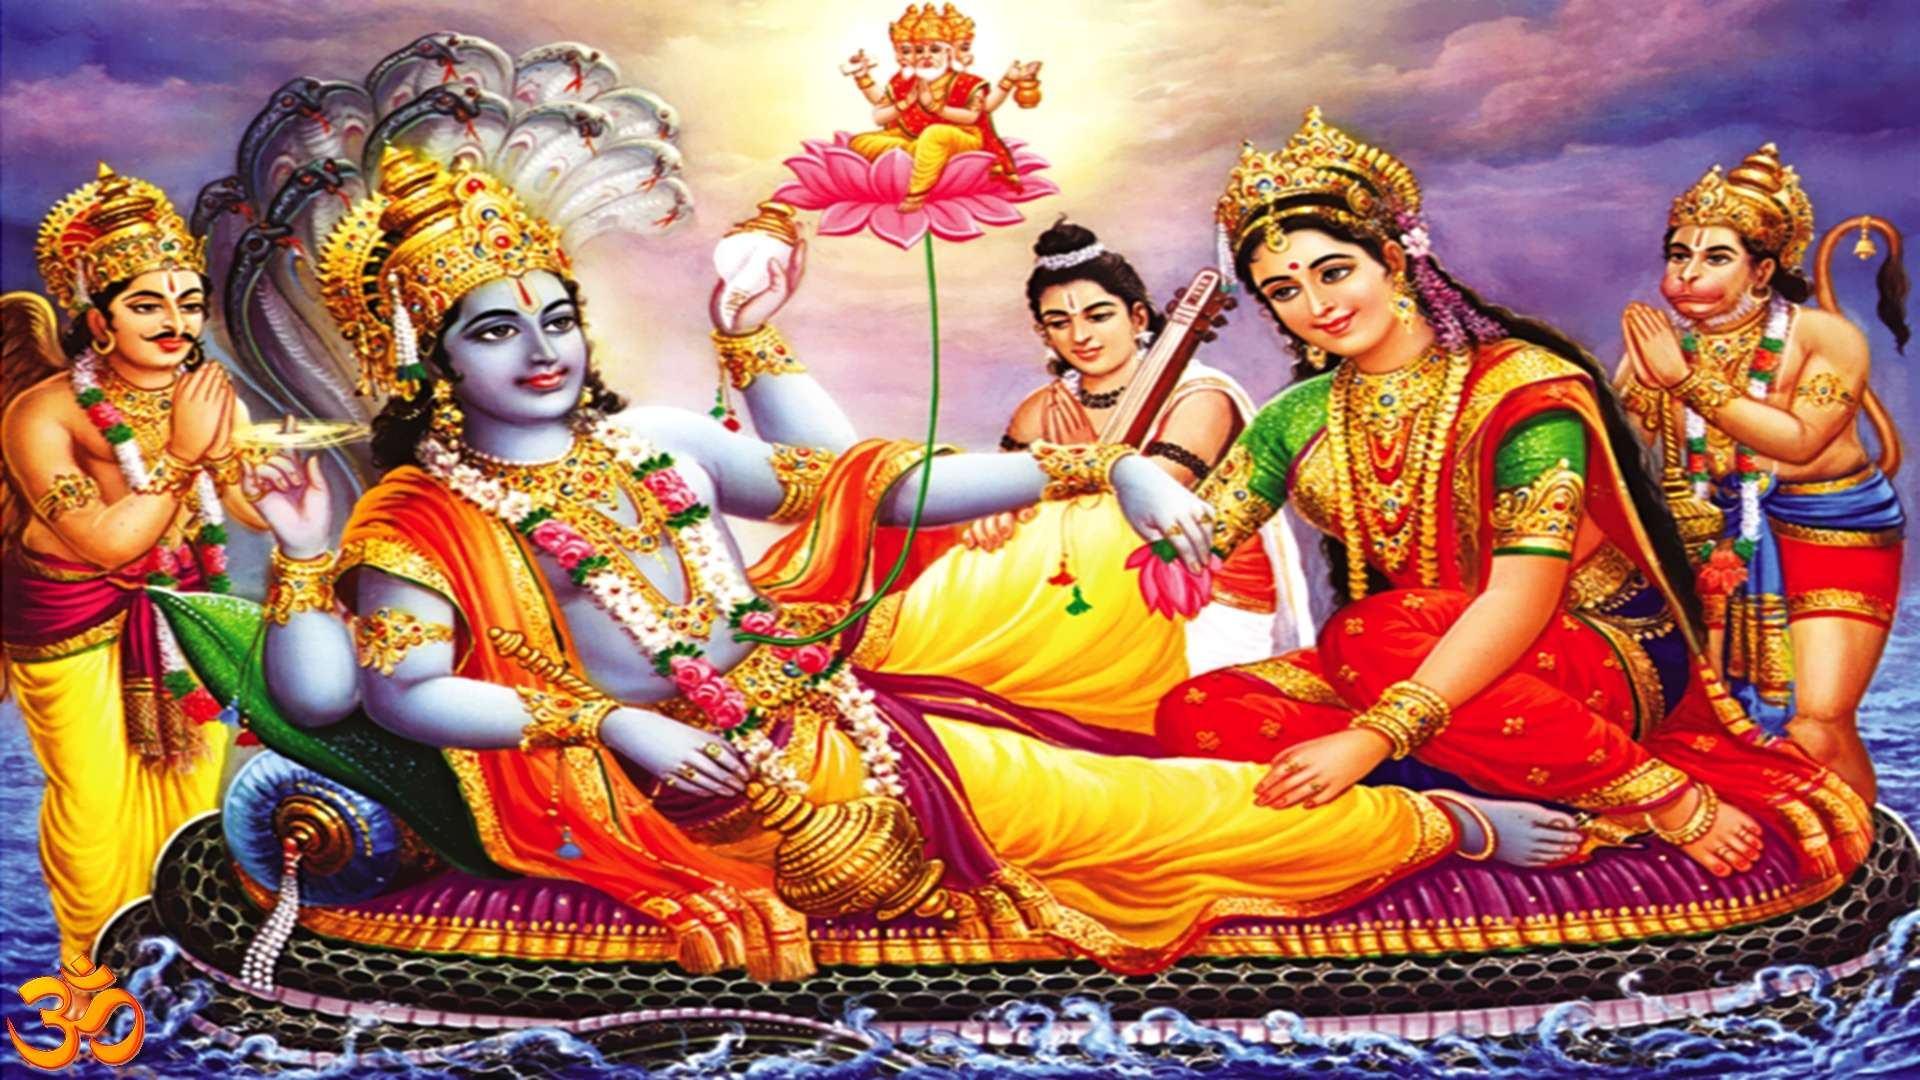 Mata Laxmi Beautiful Picture Vishnu Ji With Laxmi Ji 1920x1080 Download Hd Wallpaper Wallpapertip